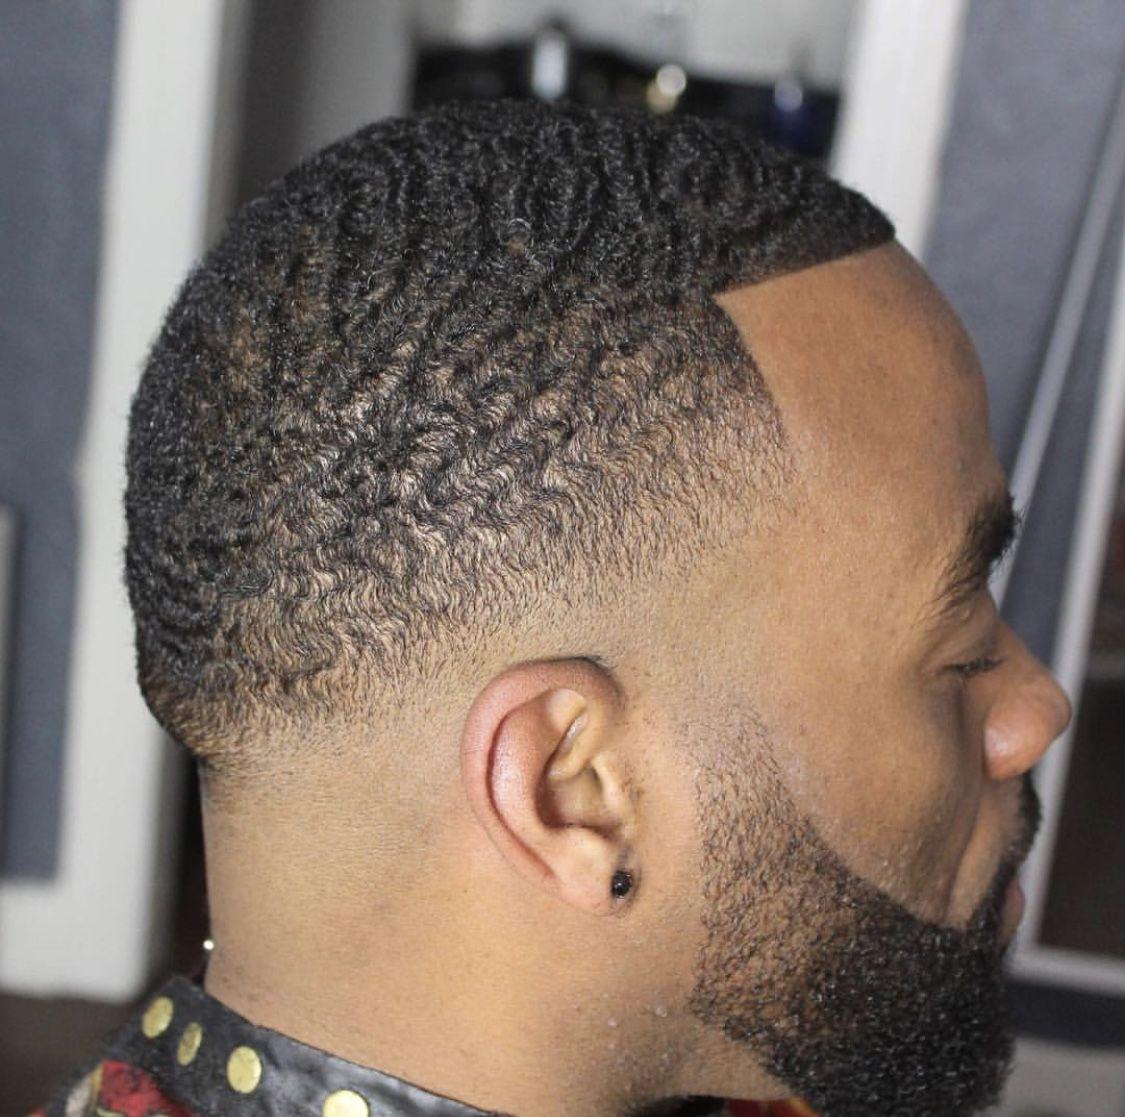 Fresh Haircut By Mickey Da Barber To See More Visit Www Mickeydabarber Com Barberproduct Barberhub Mens Haircuts Short Waves Hairstyle Men Haircuts For Men